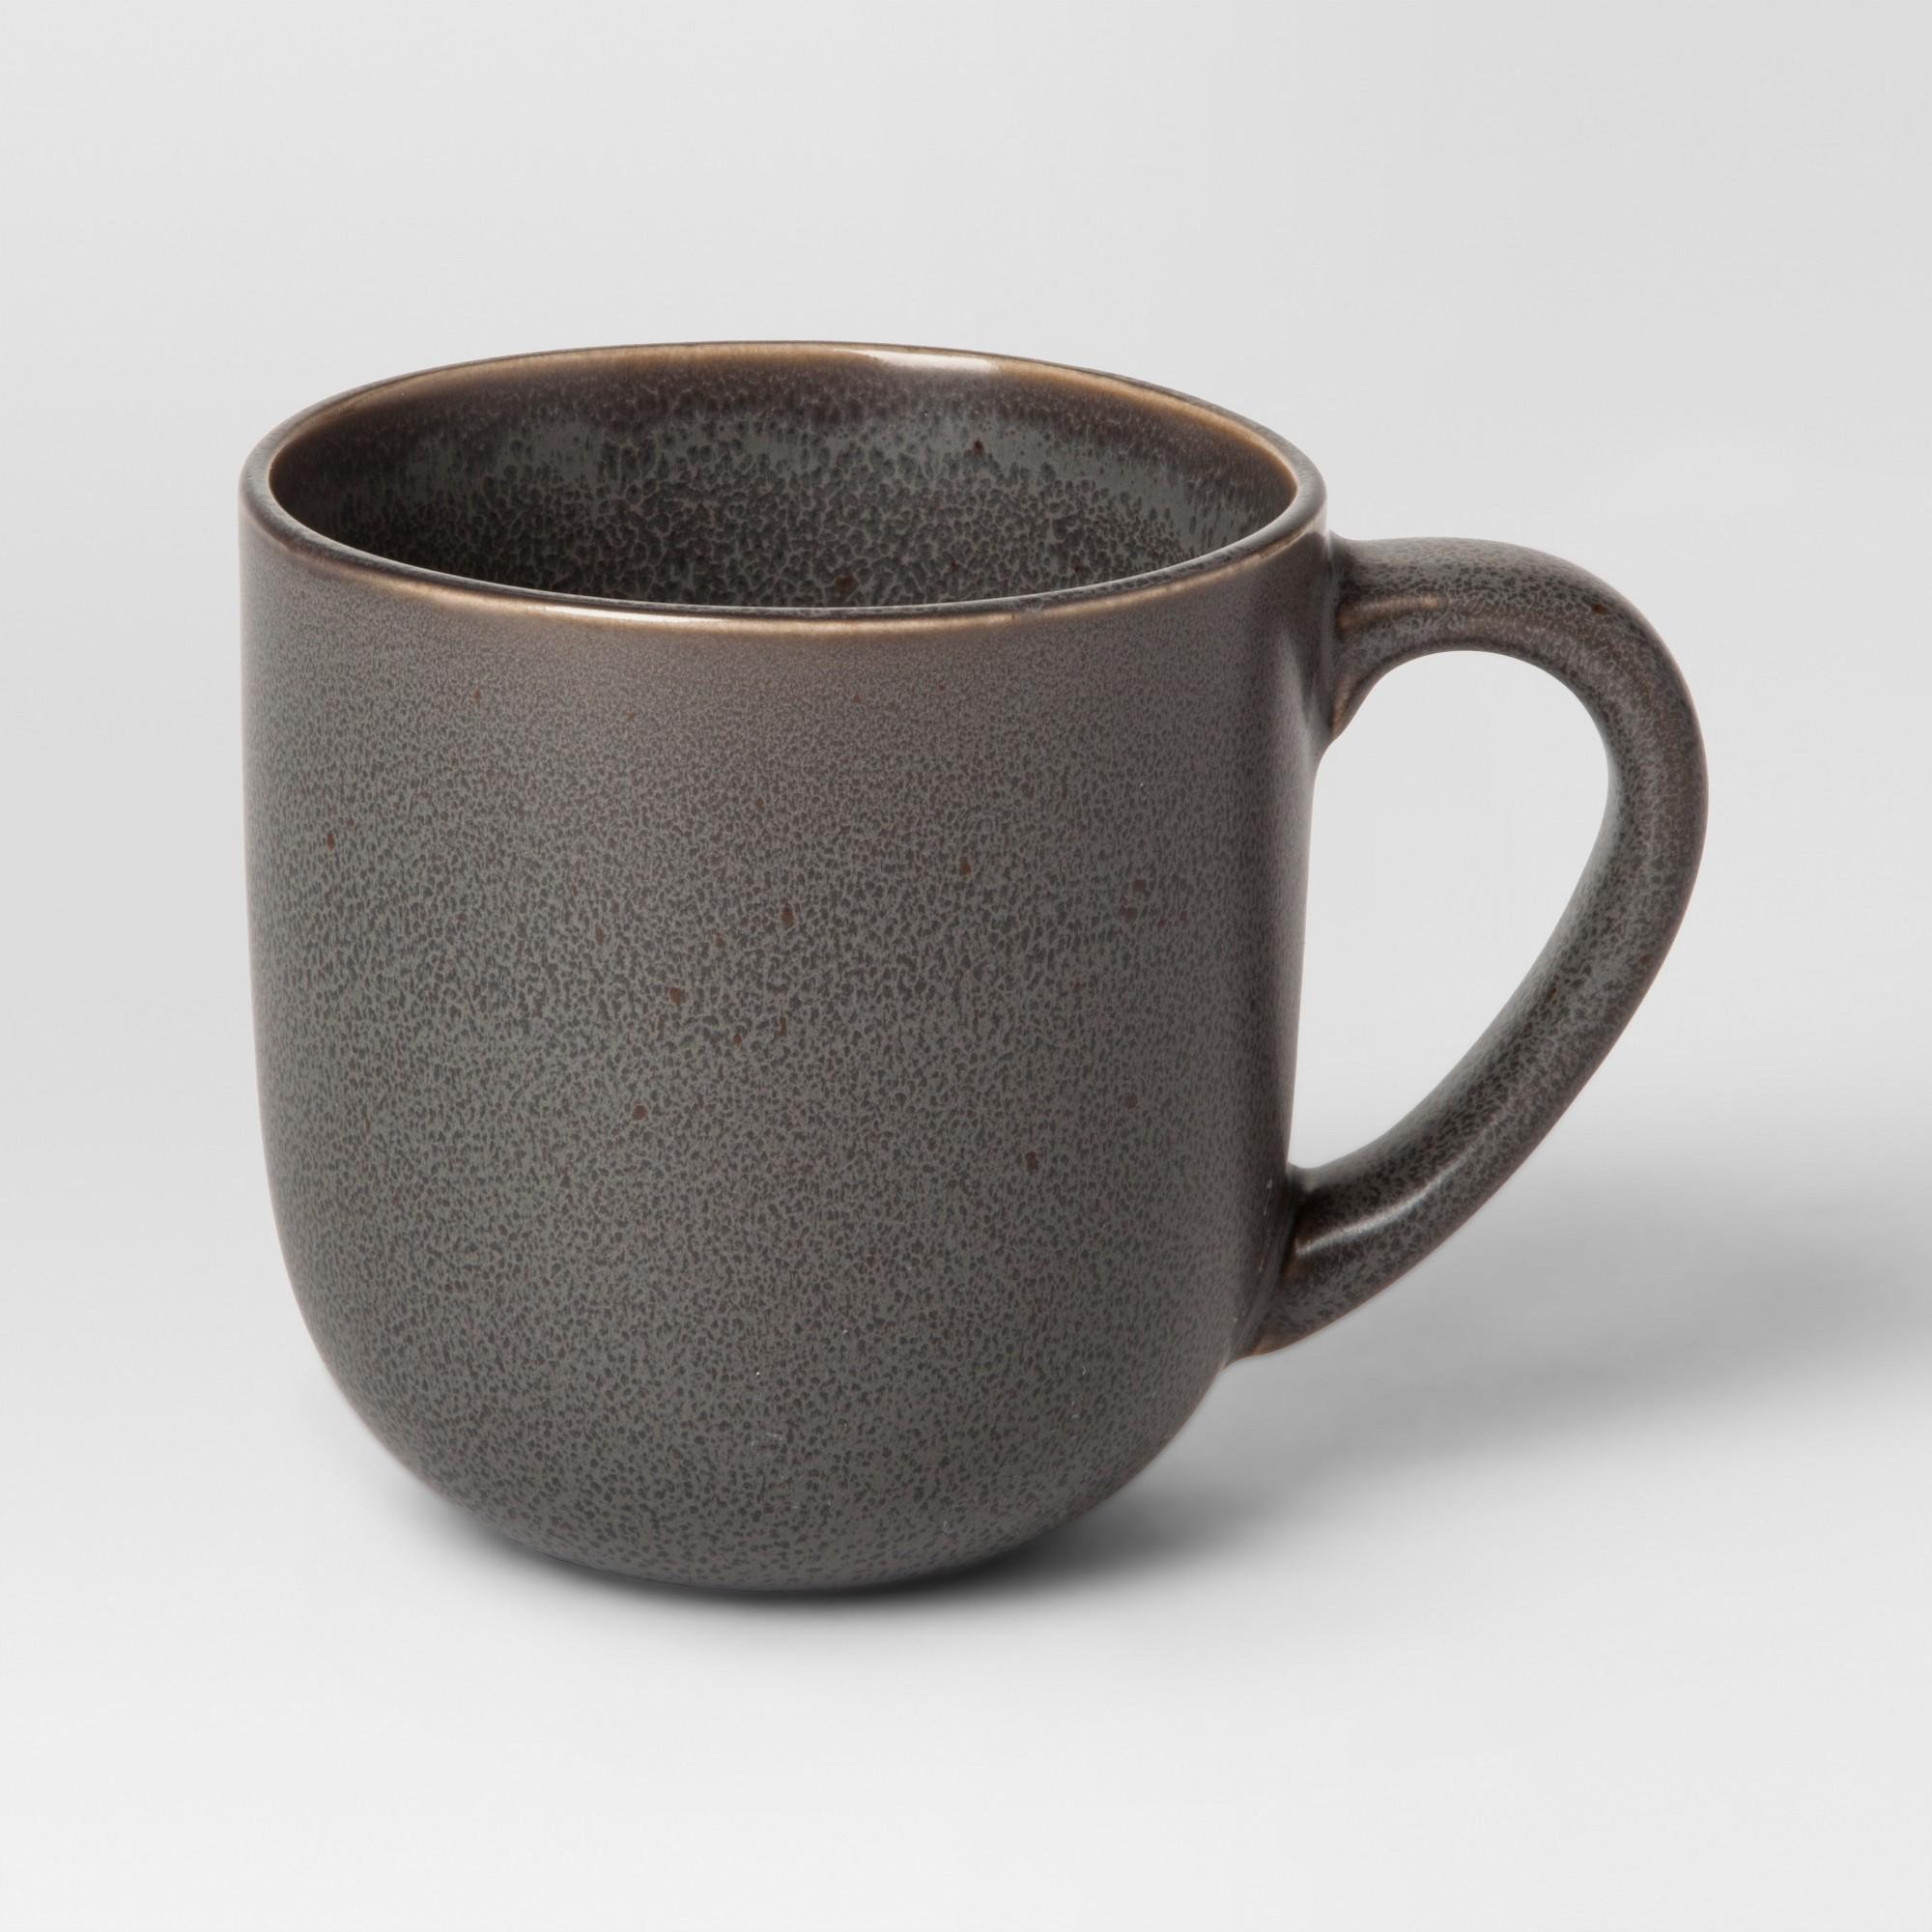 Tilley Stoneware Mug 16.5oz Black - Project 62 , Size: 1pc ...